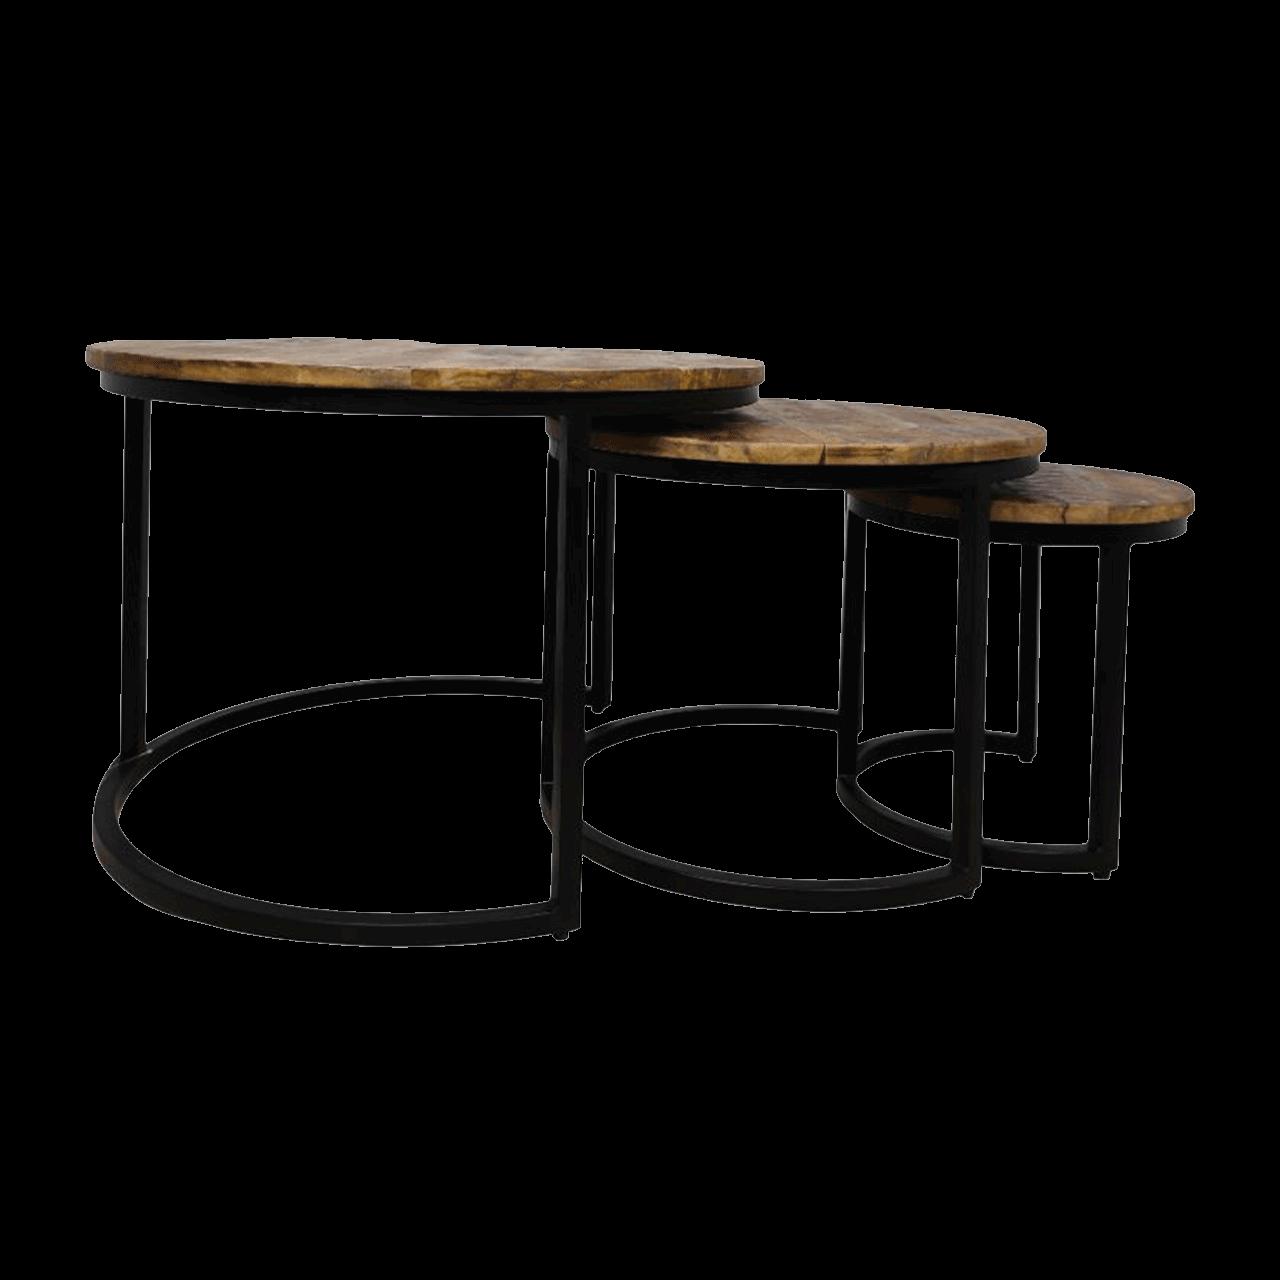 Wooden Art Beistelltische 3er Set